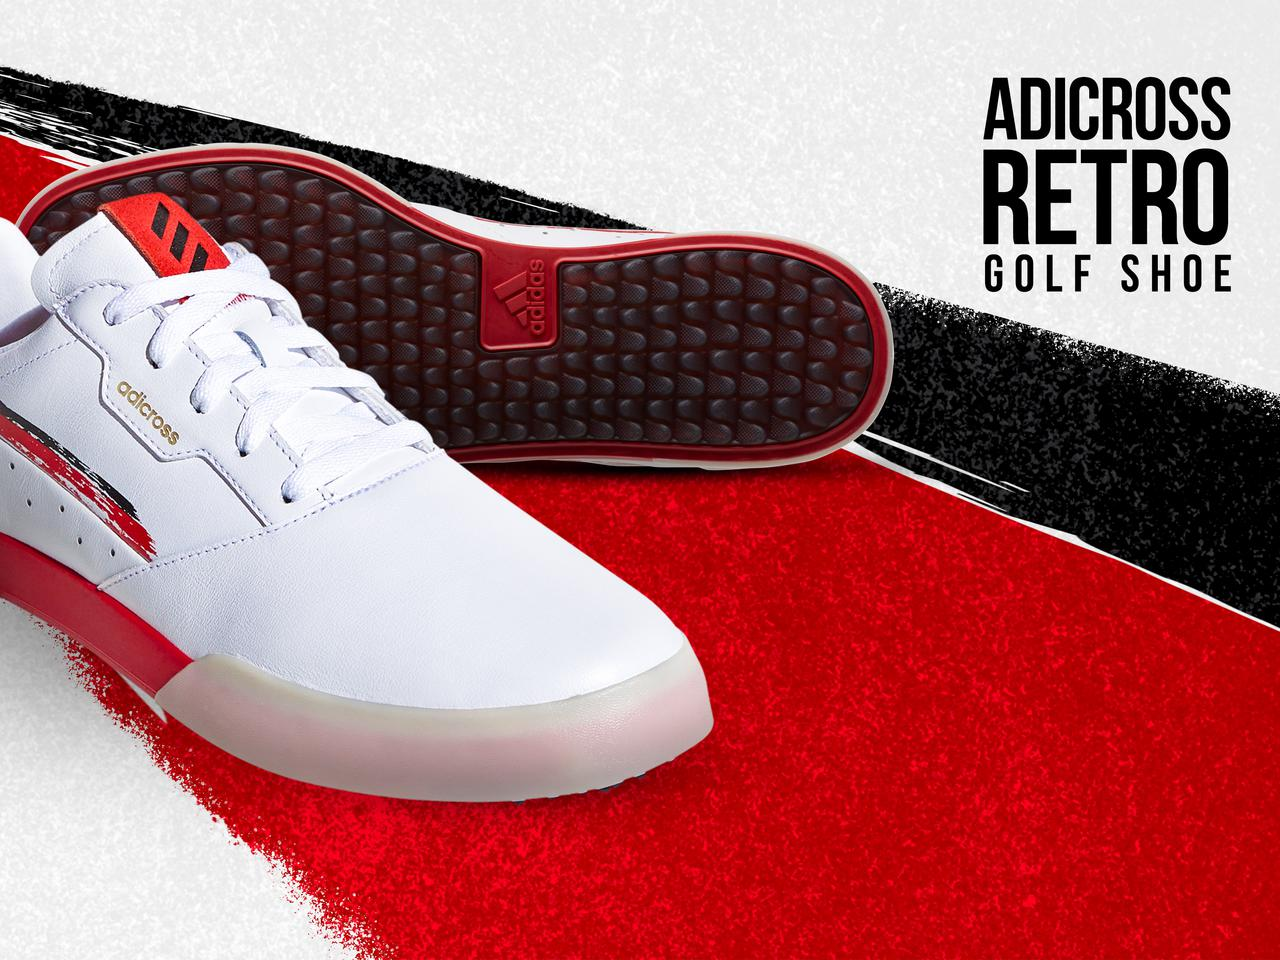 Spotlight on the adidas retro Golf Shoe | Manchester United